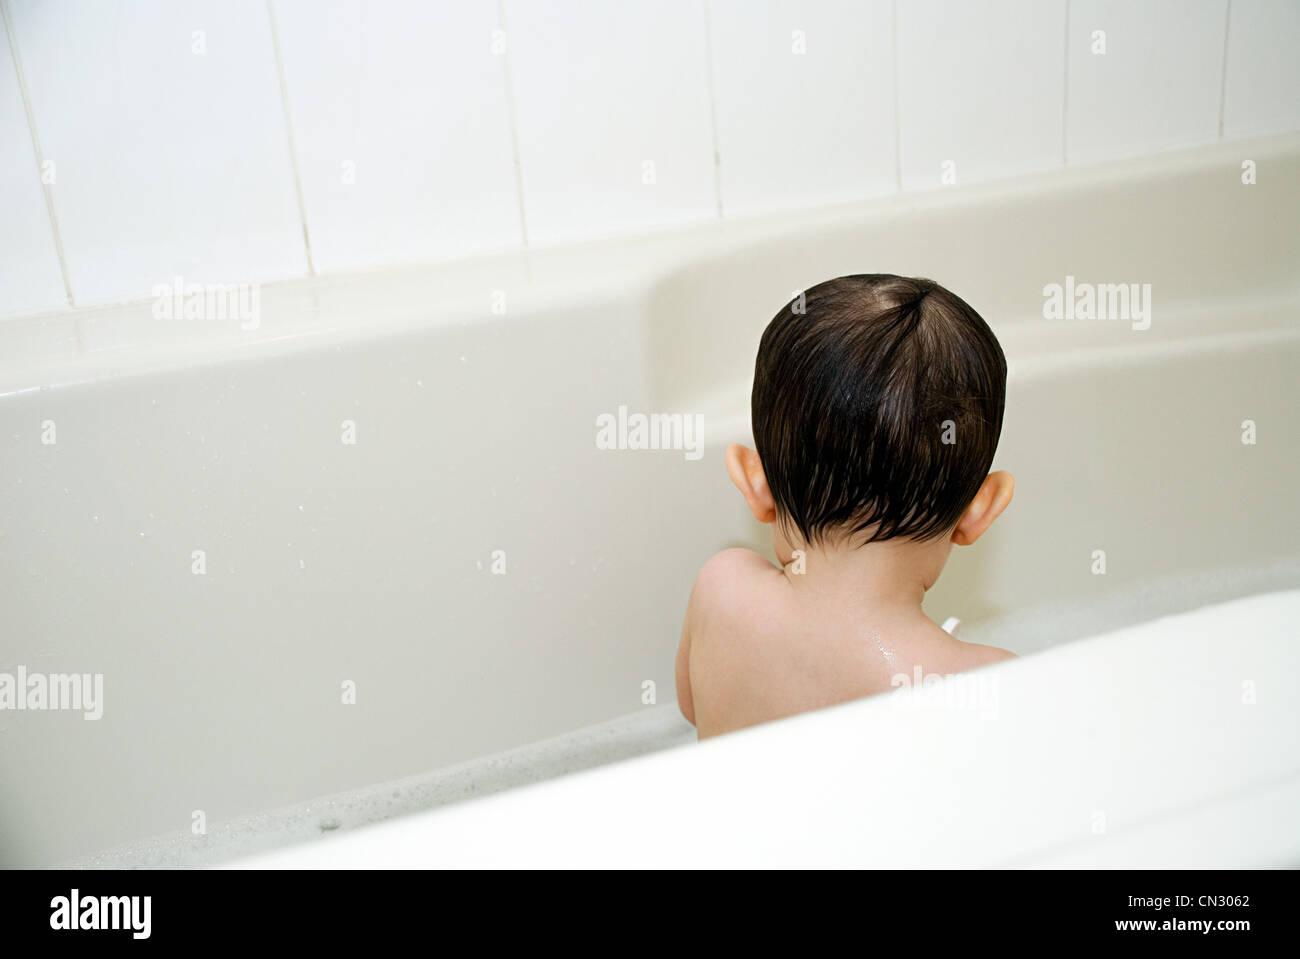 bathtub photos bathtub images alamy. Black Bedroom Furniture Sets. Home Design Ideas